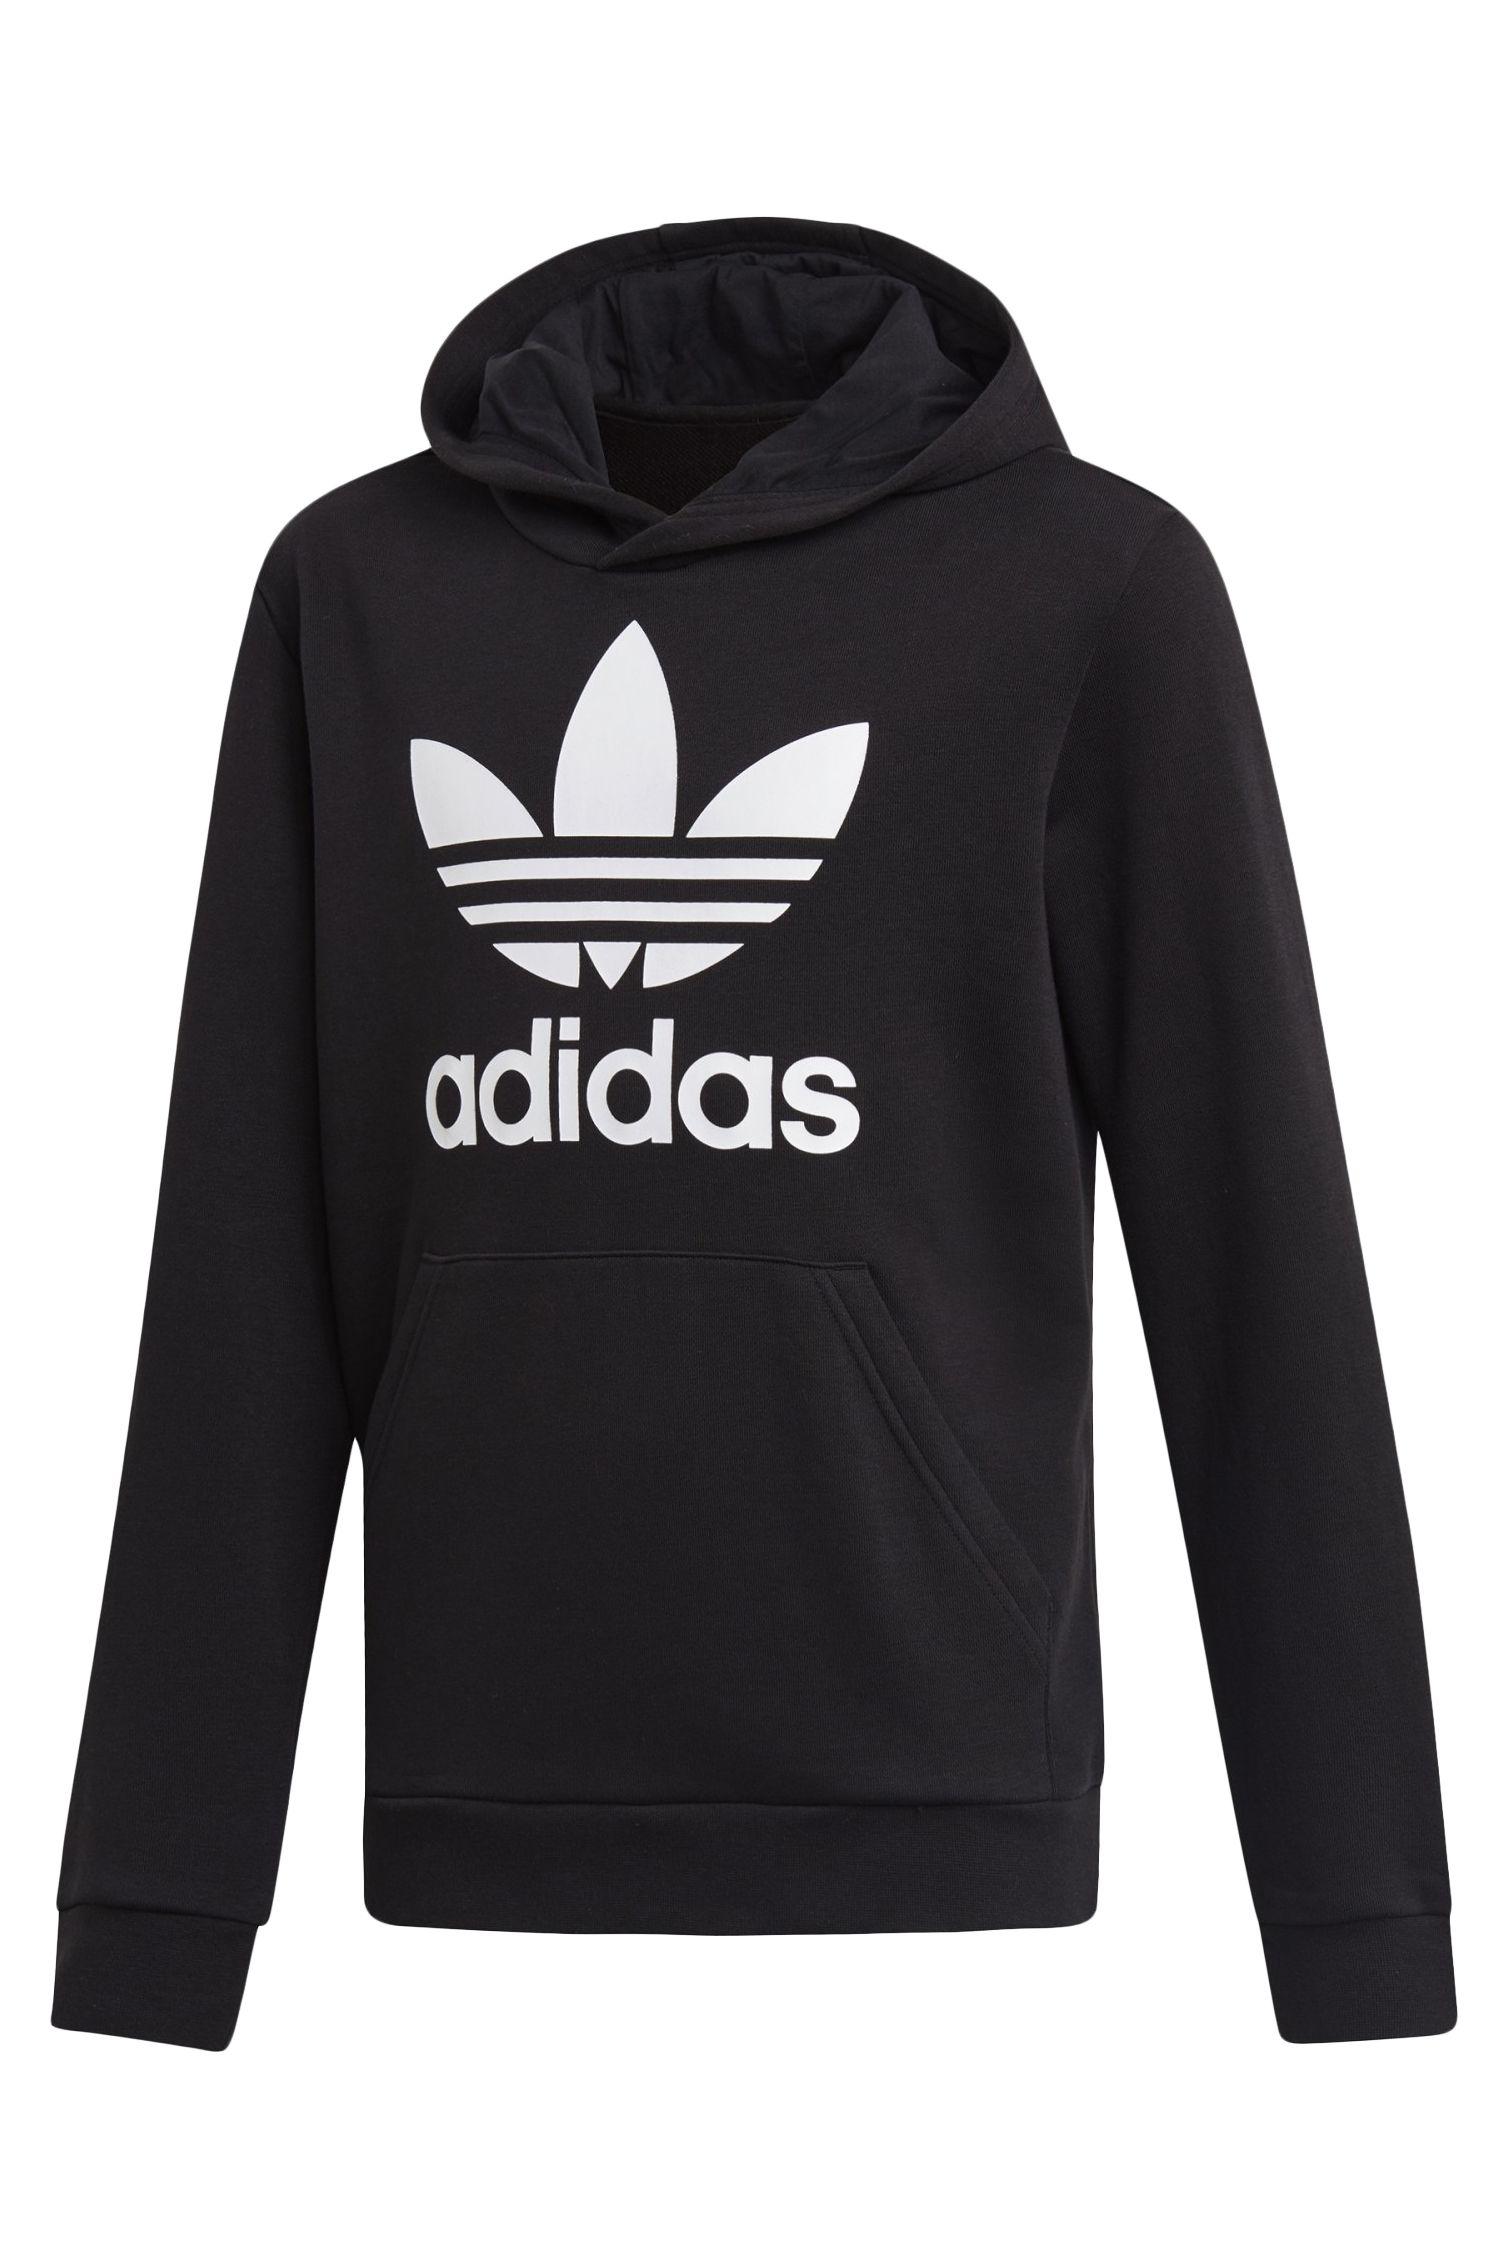 Sweat Capuz Adidas TREFOIL HOODIE Black/White